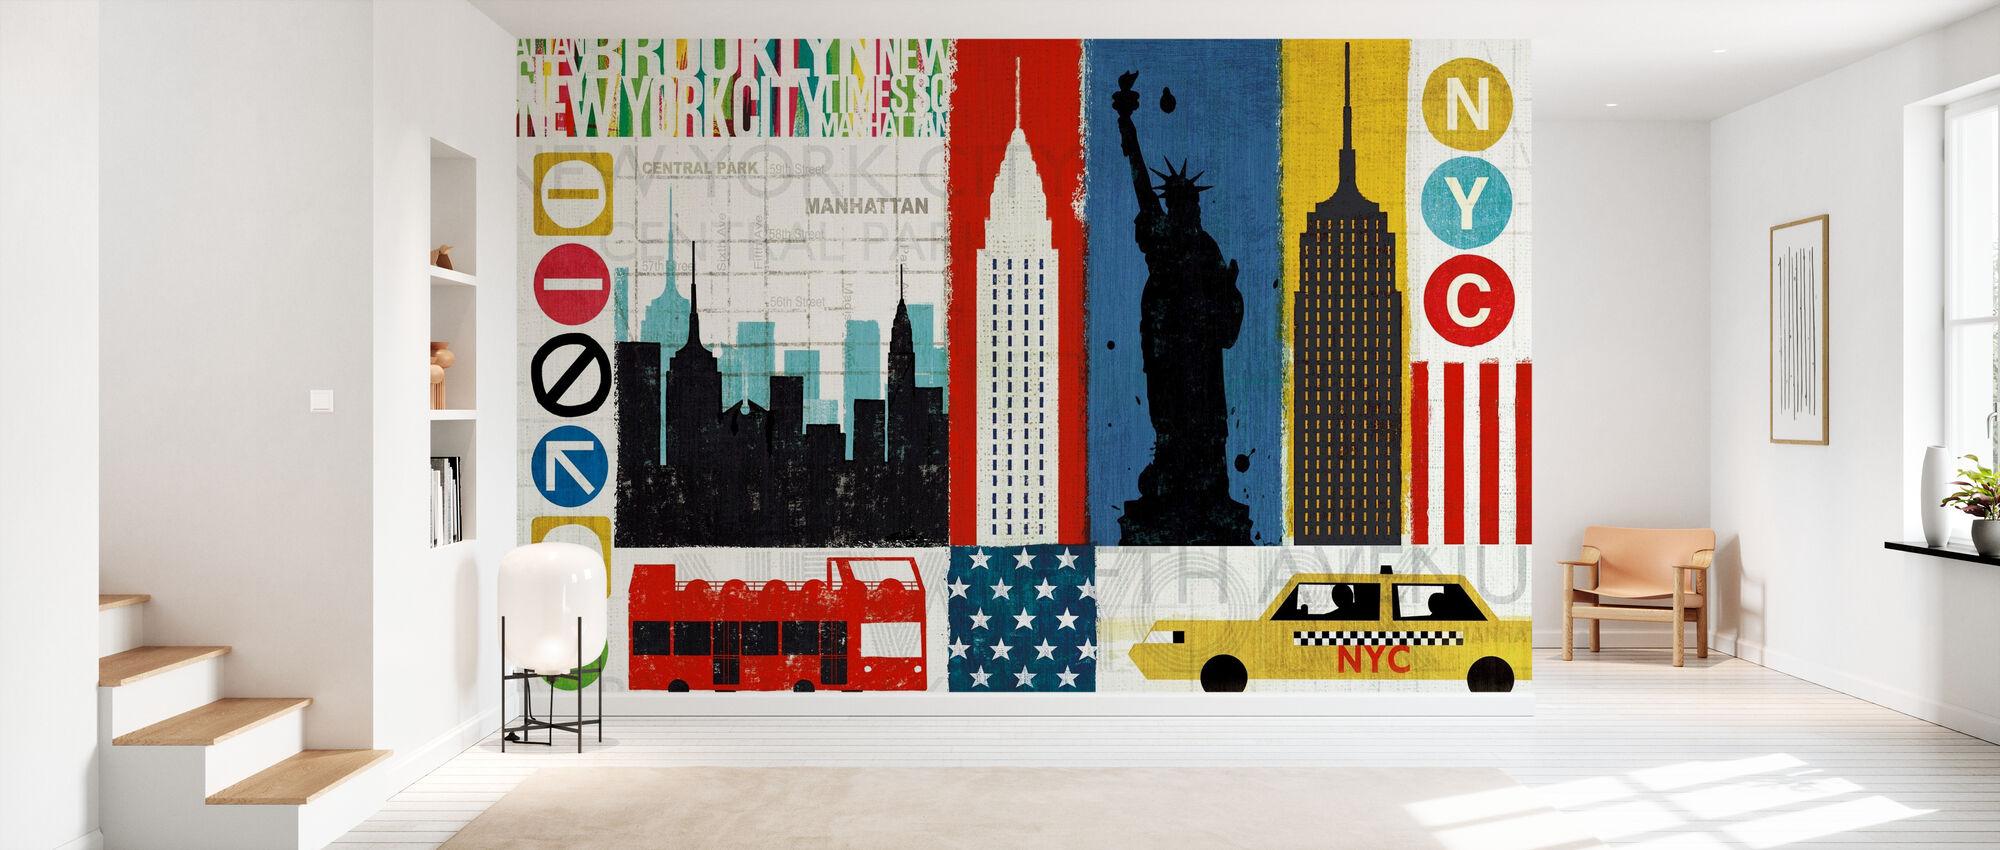 New Yorkin kaupungin kokemus - Tapetti - Aula